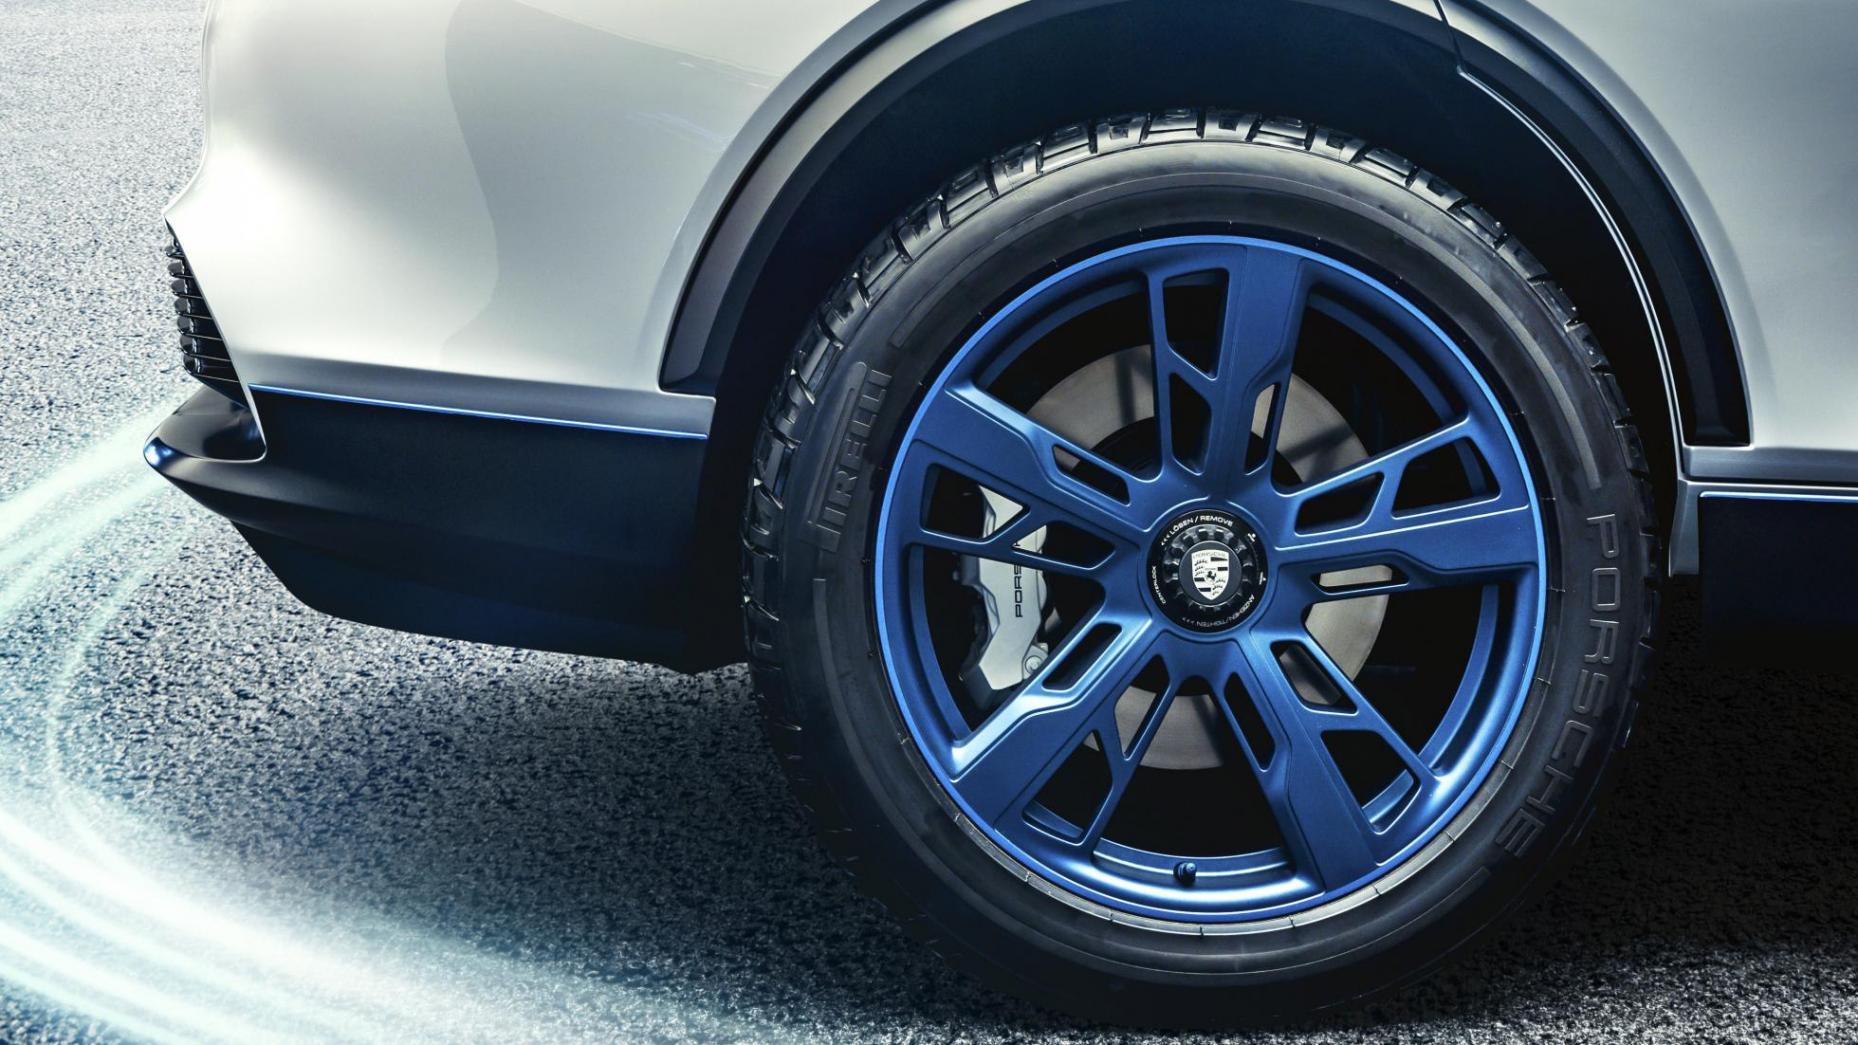 Porsche Mission E Cross Turismo Velgen Blauw